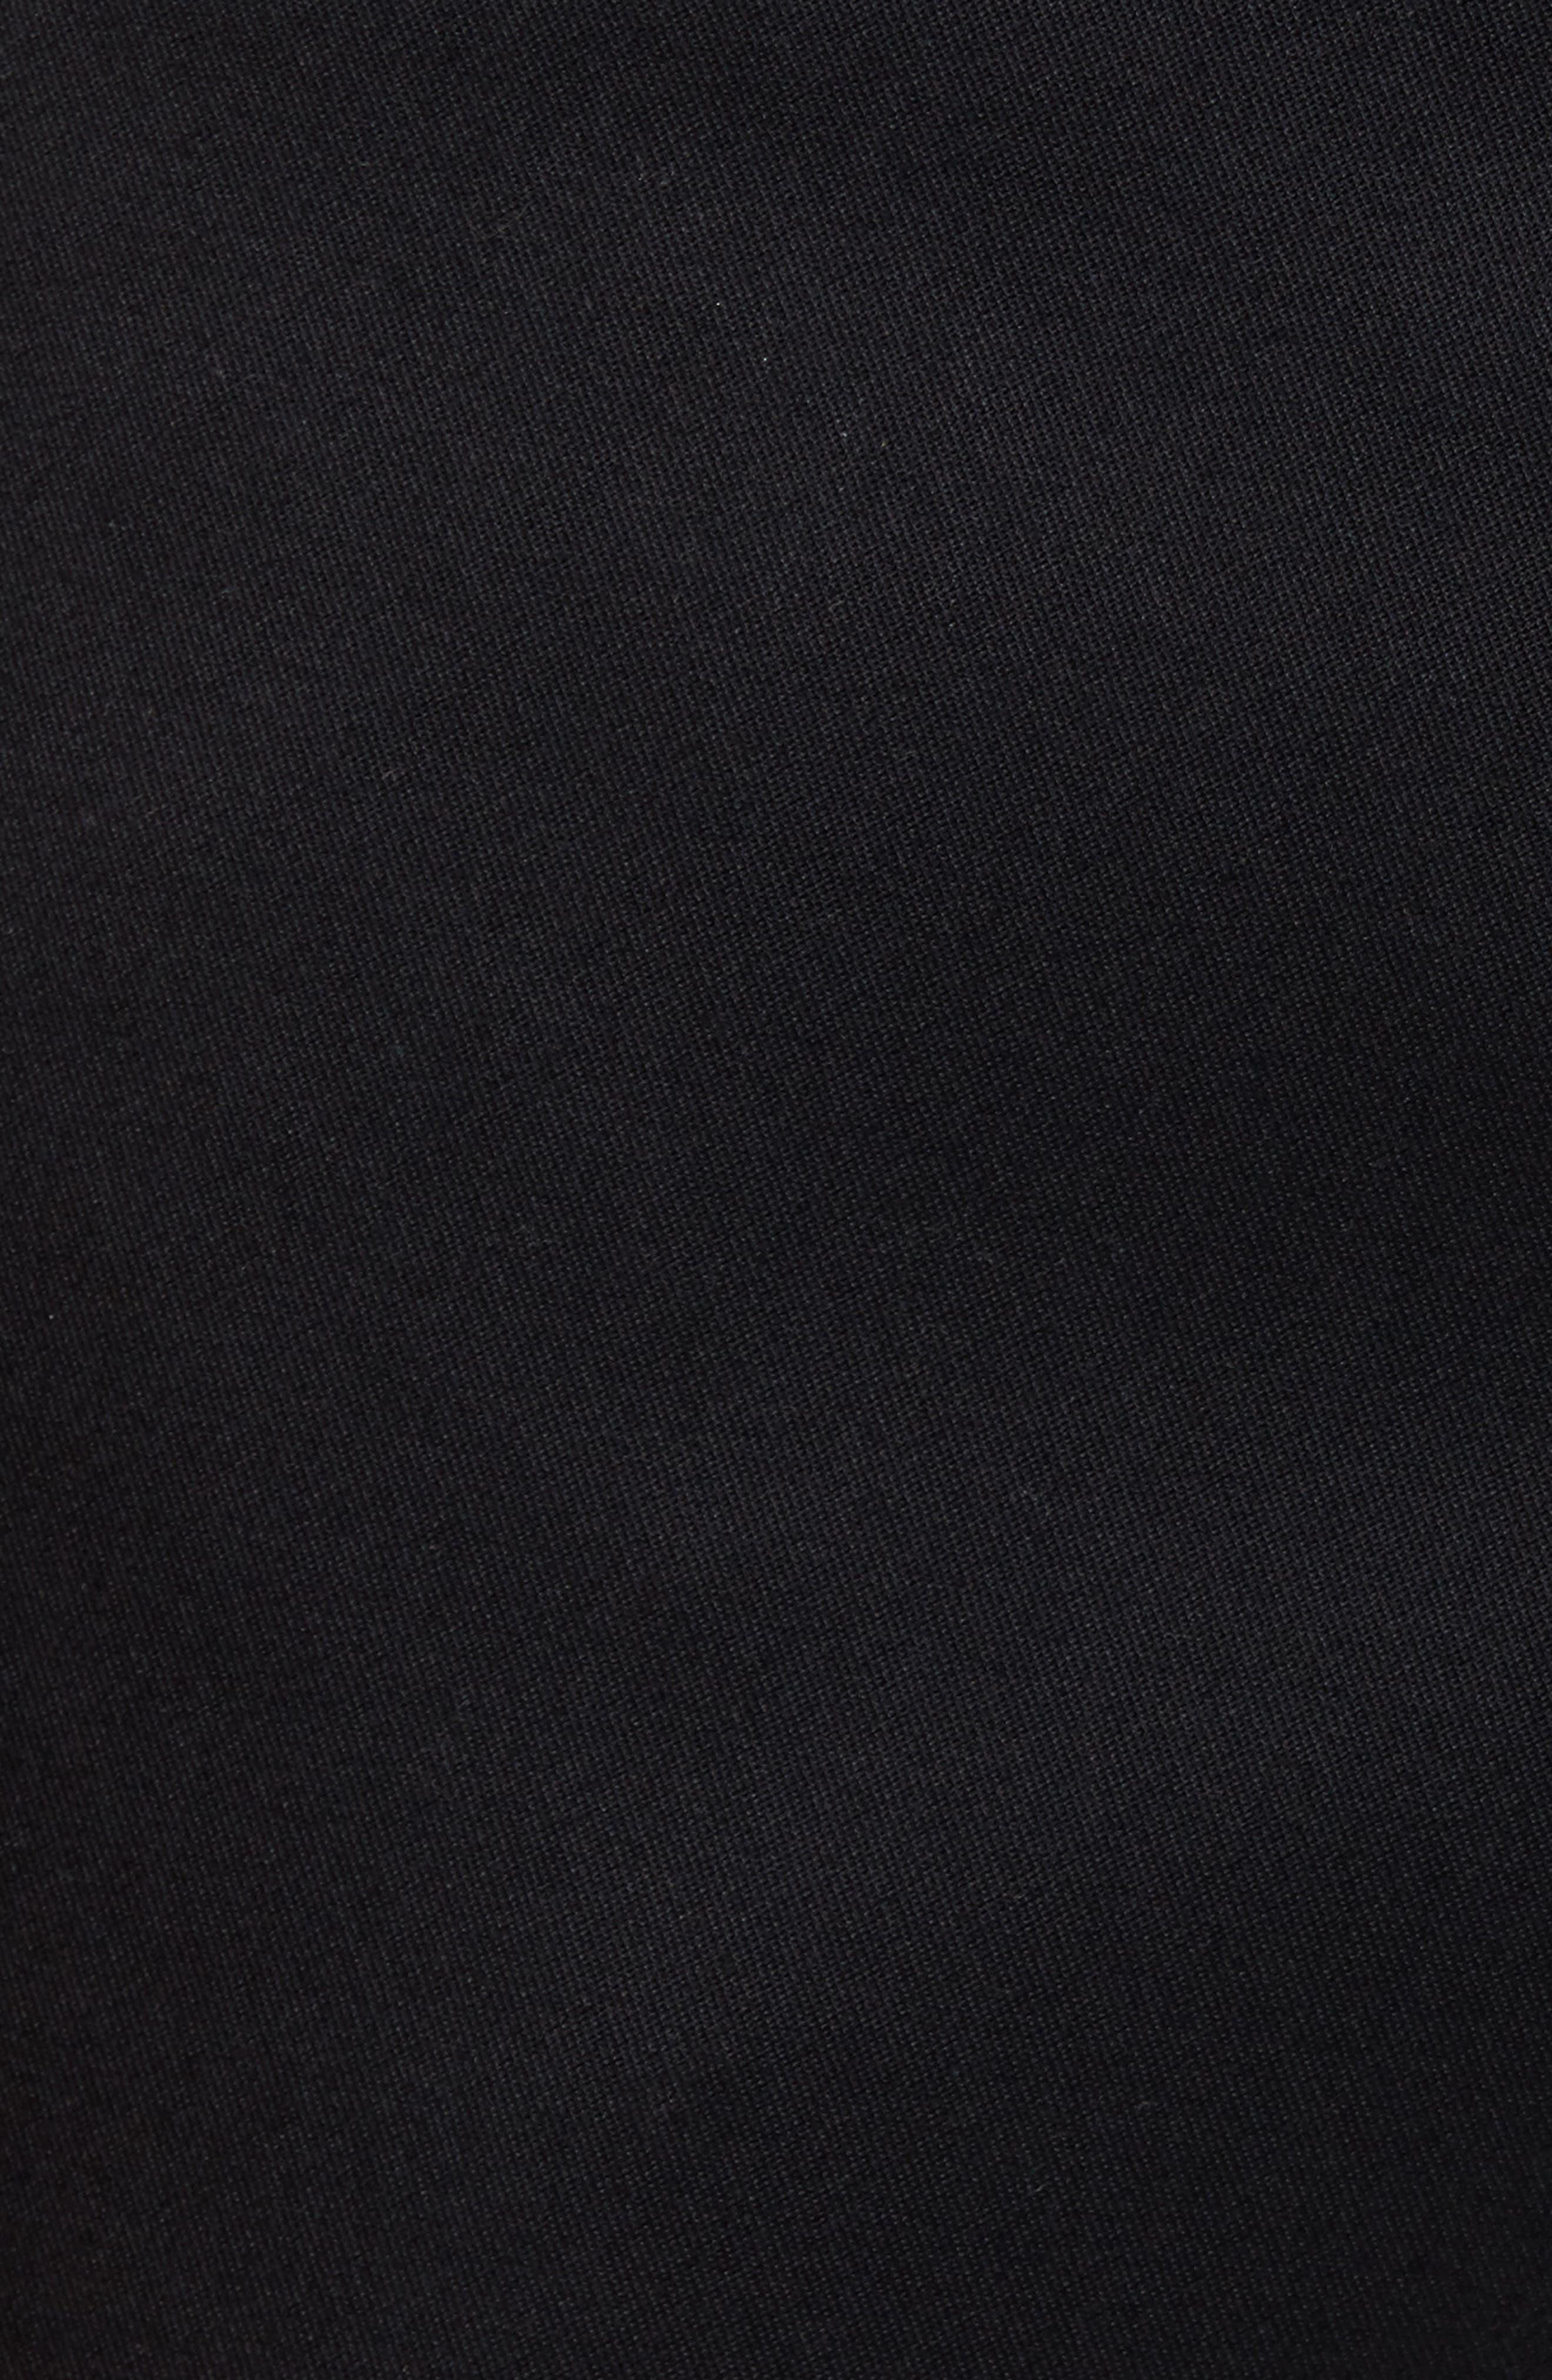 Slim Fit Non-Iron Chinos,                             Alternate thumbnail 5, color,                             BLACK